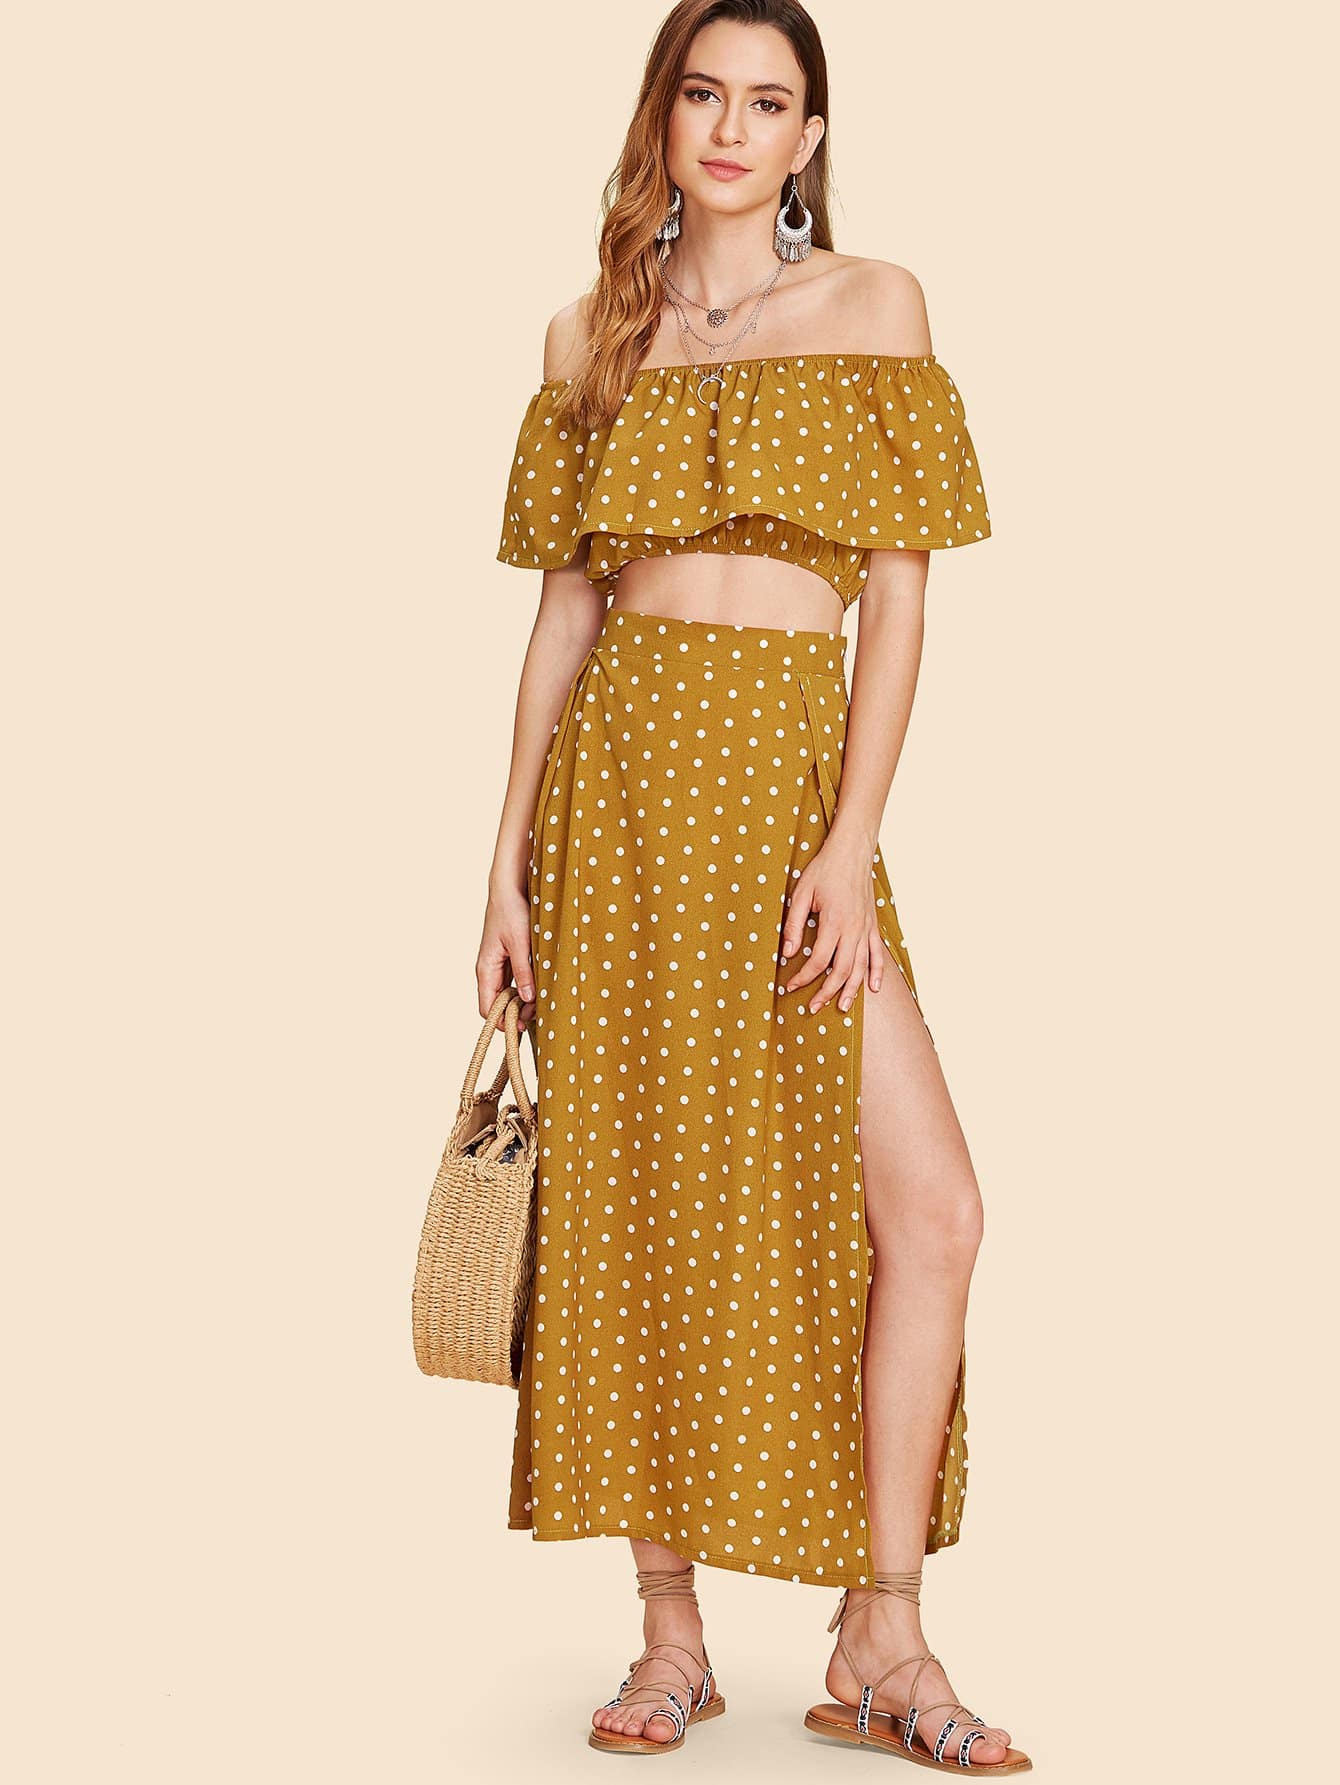 Off Shoulder Polka Dot Top With Splited Dress матрас dreamline springless orto 9 90х195 см